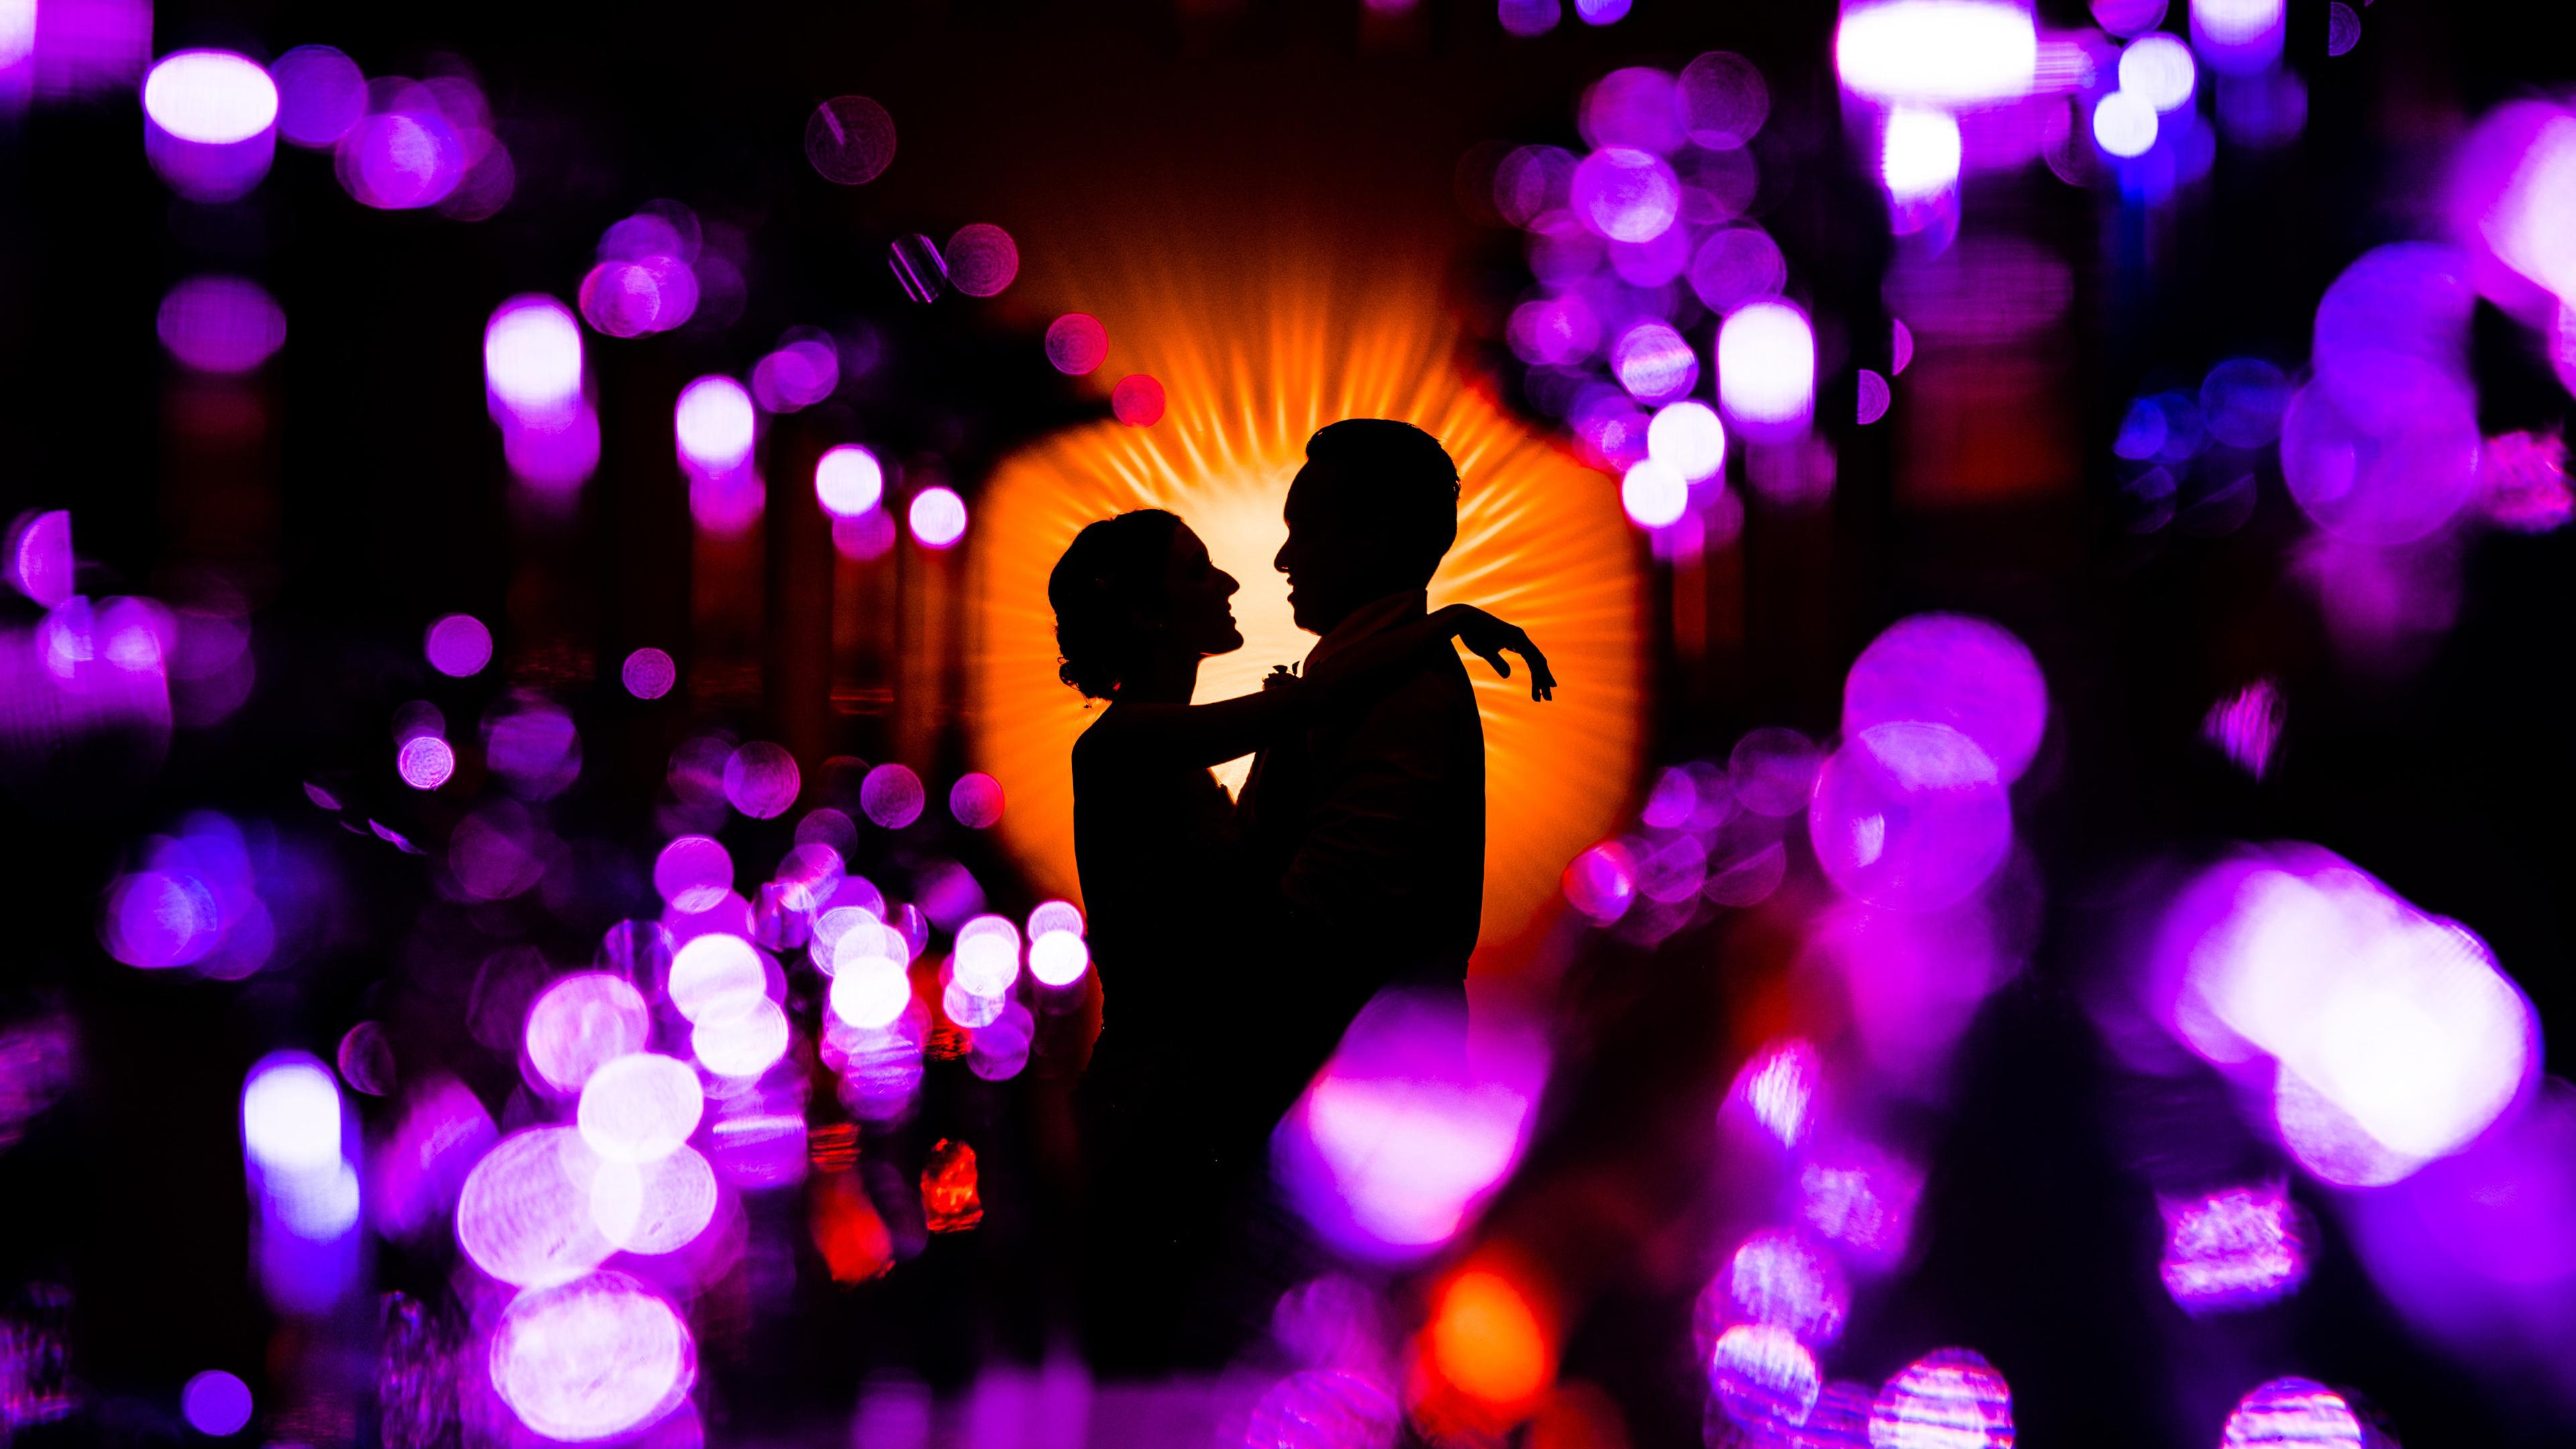 couple-love-silhouette-uk.jpg